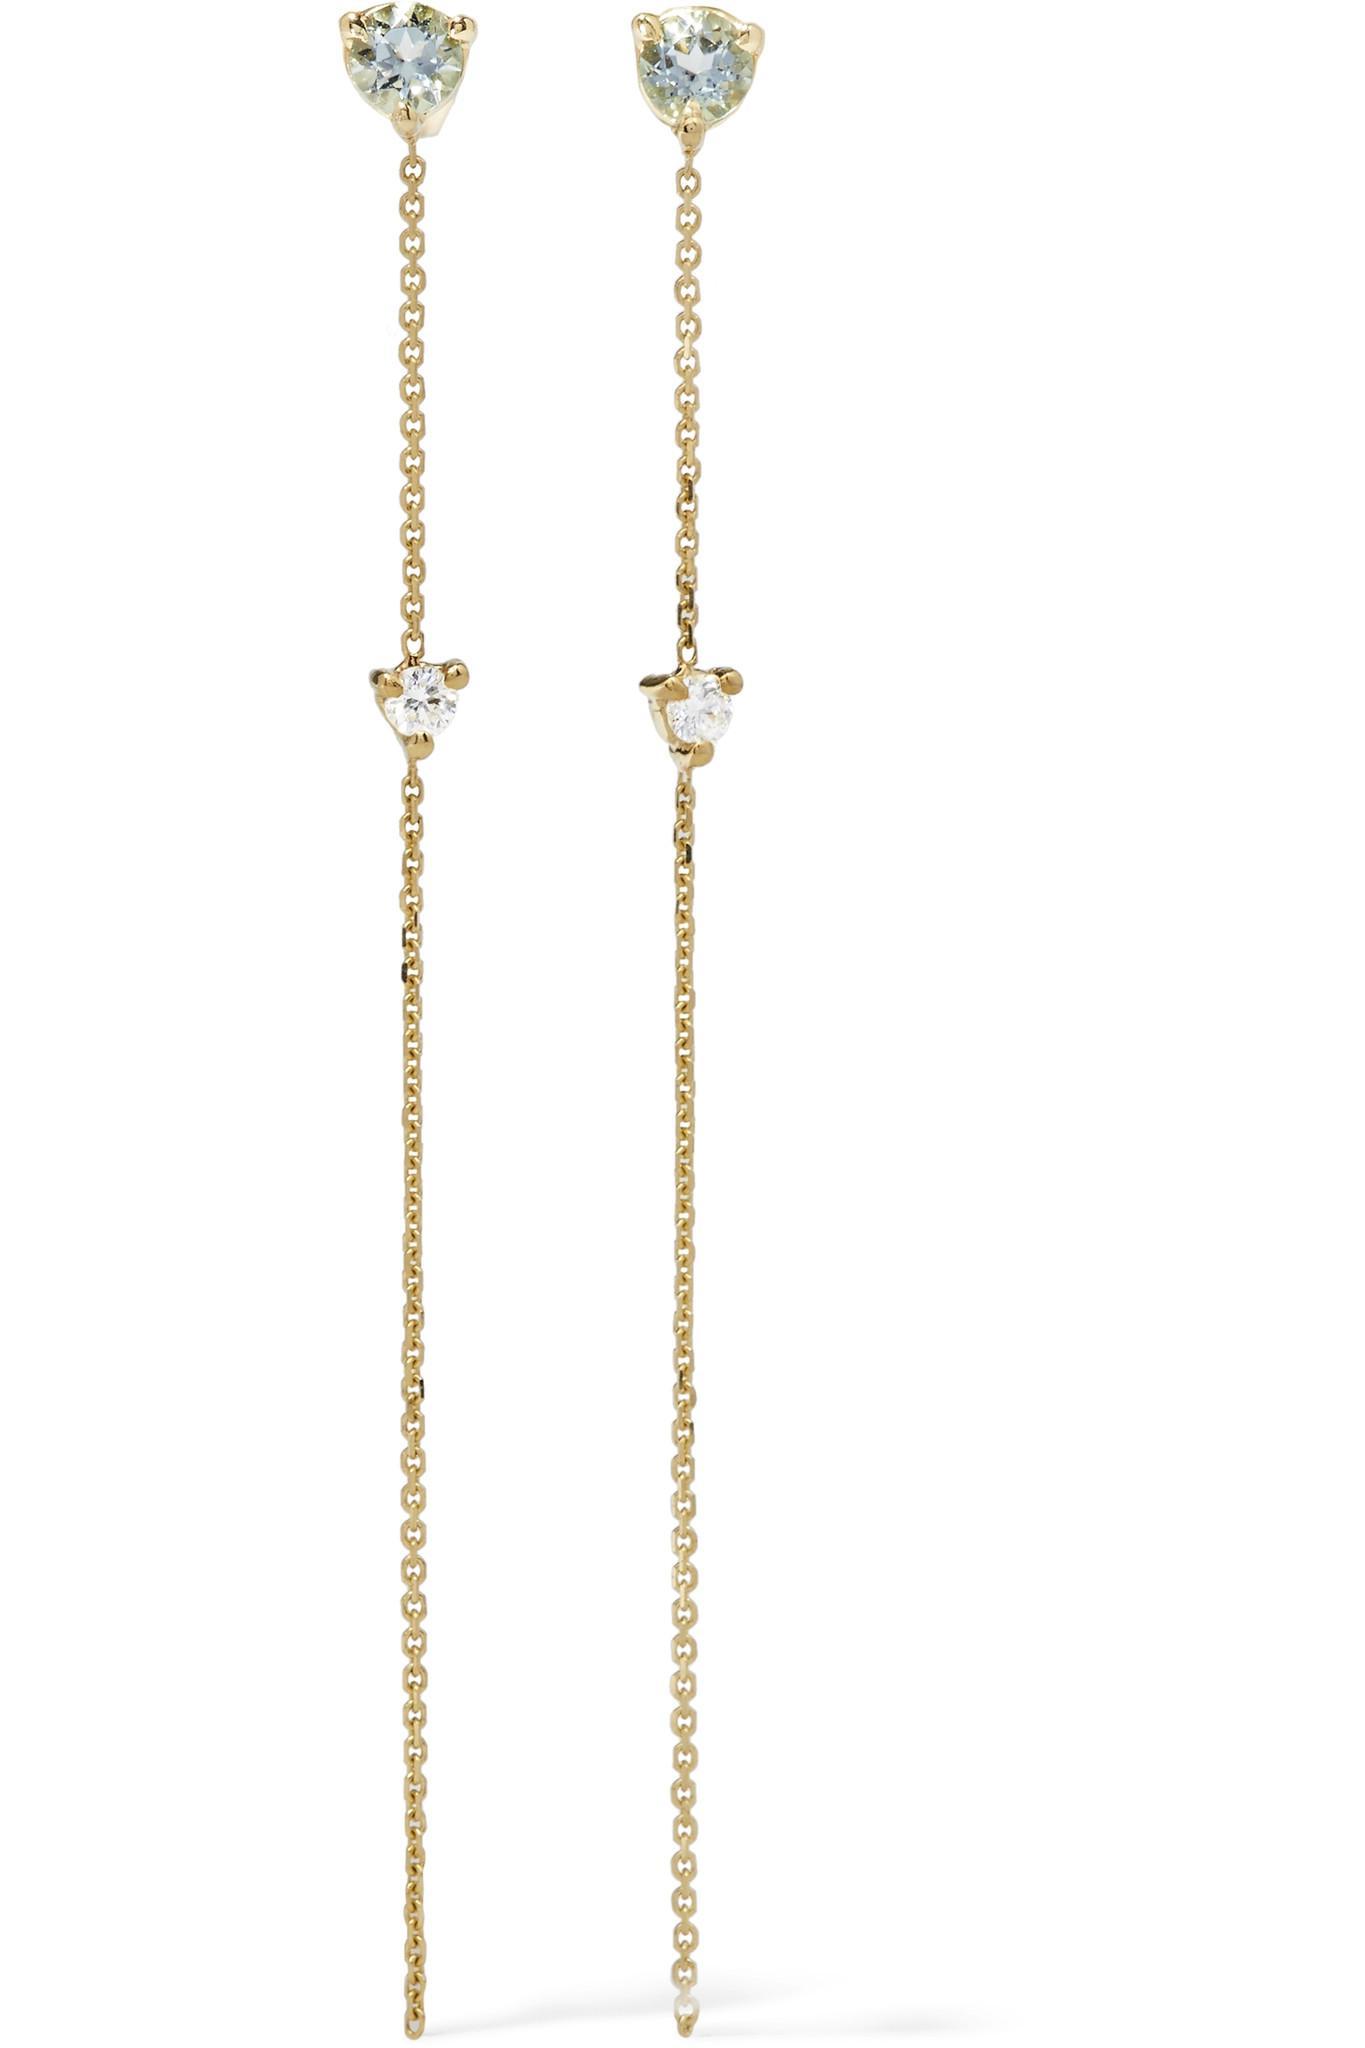 Wwake 14-karat Gold, Tourmaline And Diamond Earring